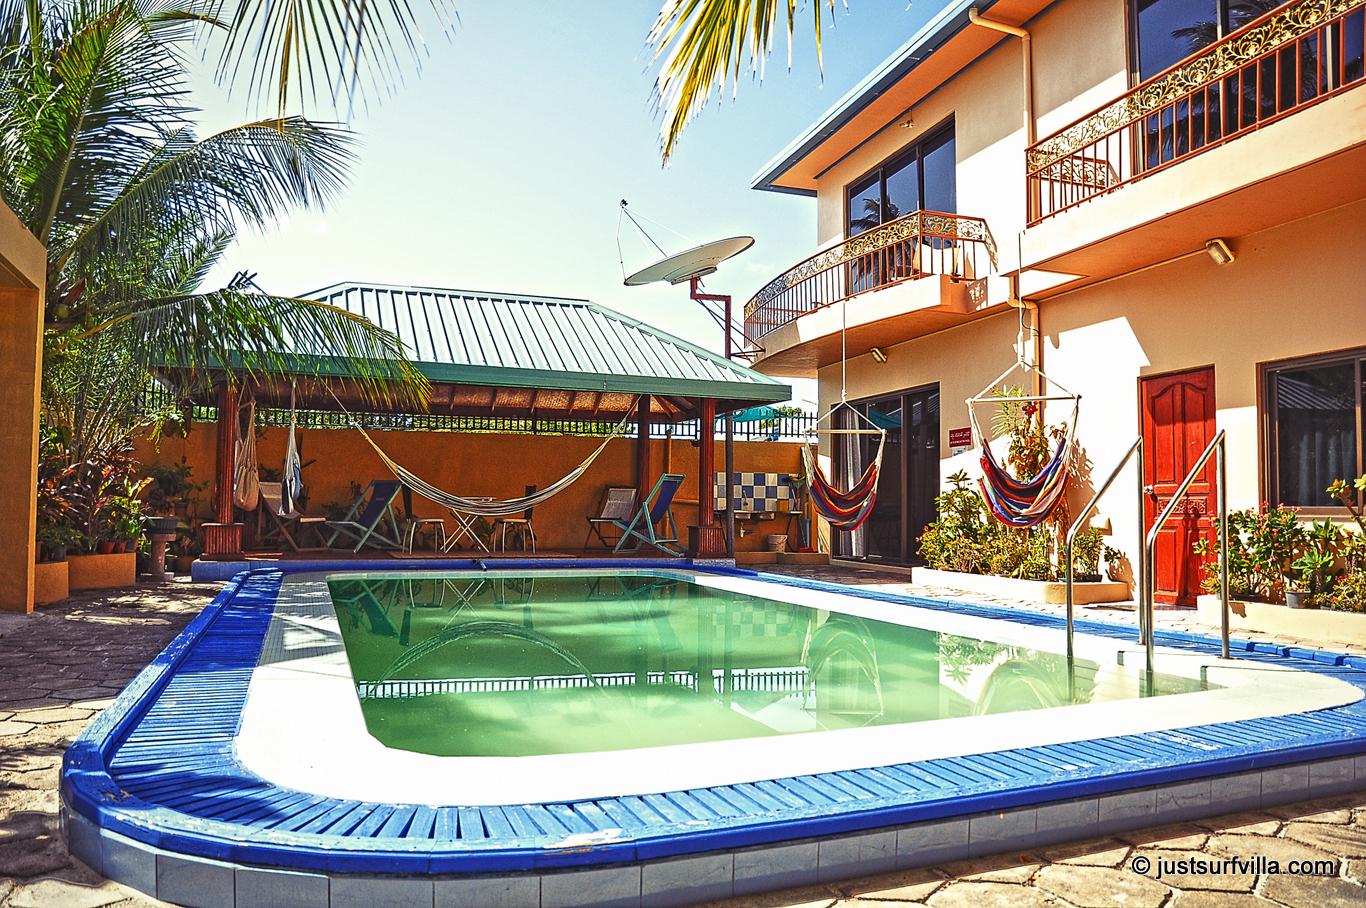 Just Surf Villa & Lodge Maldives